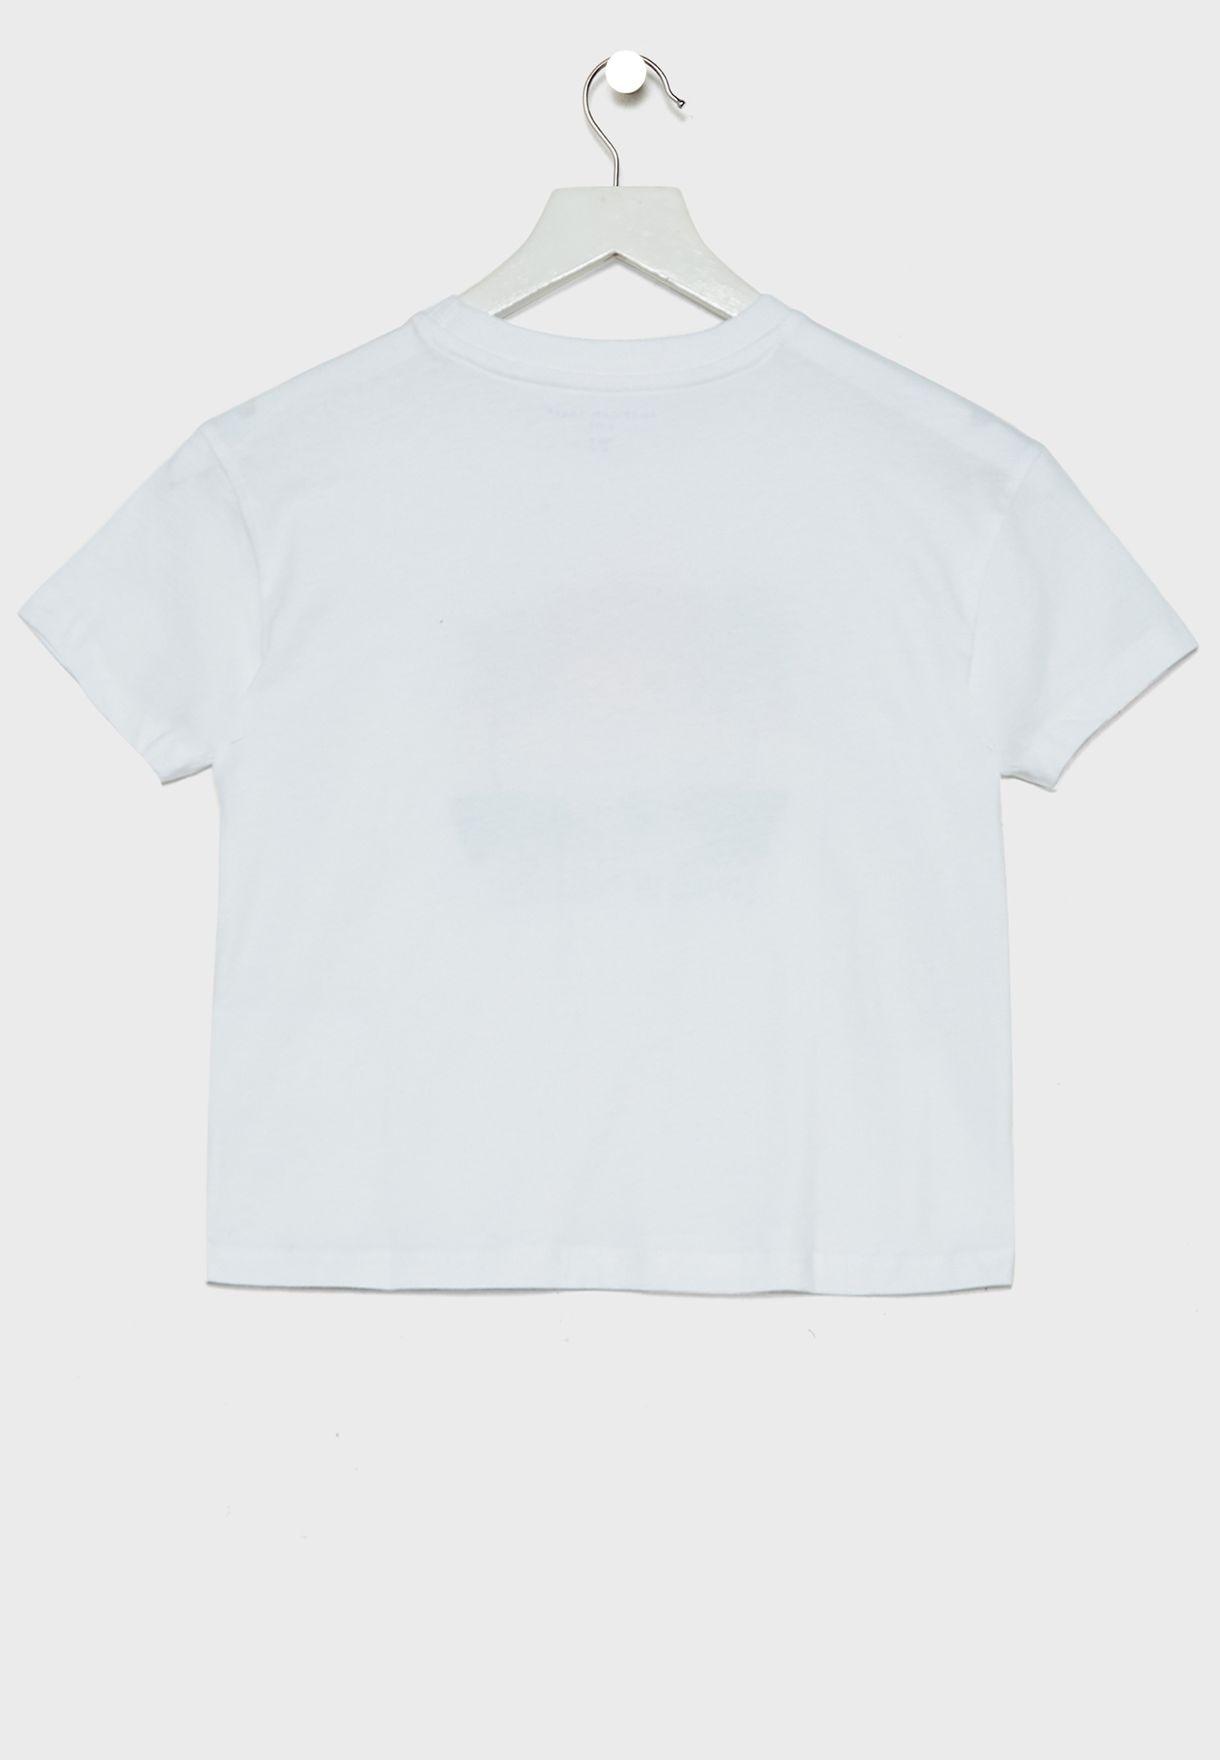 Kids Paradise Graphic T-Shirt